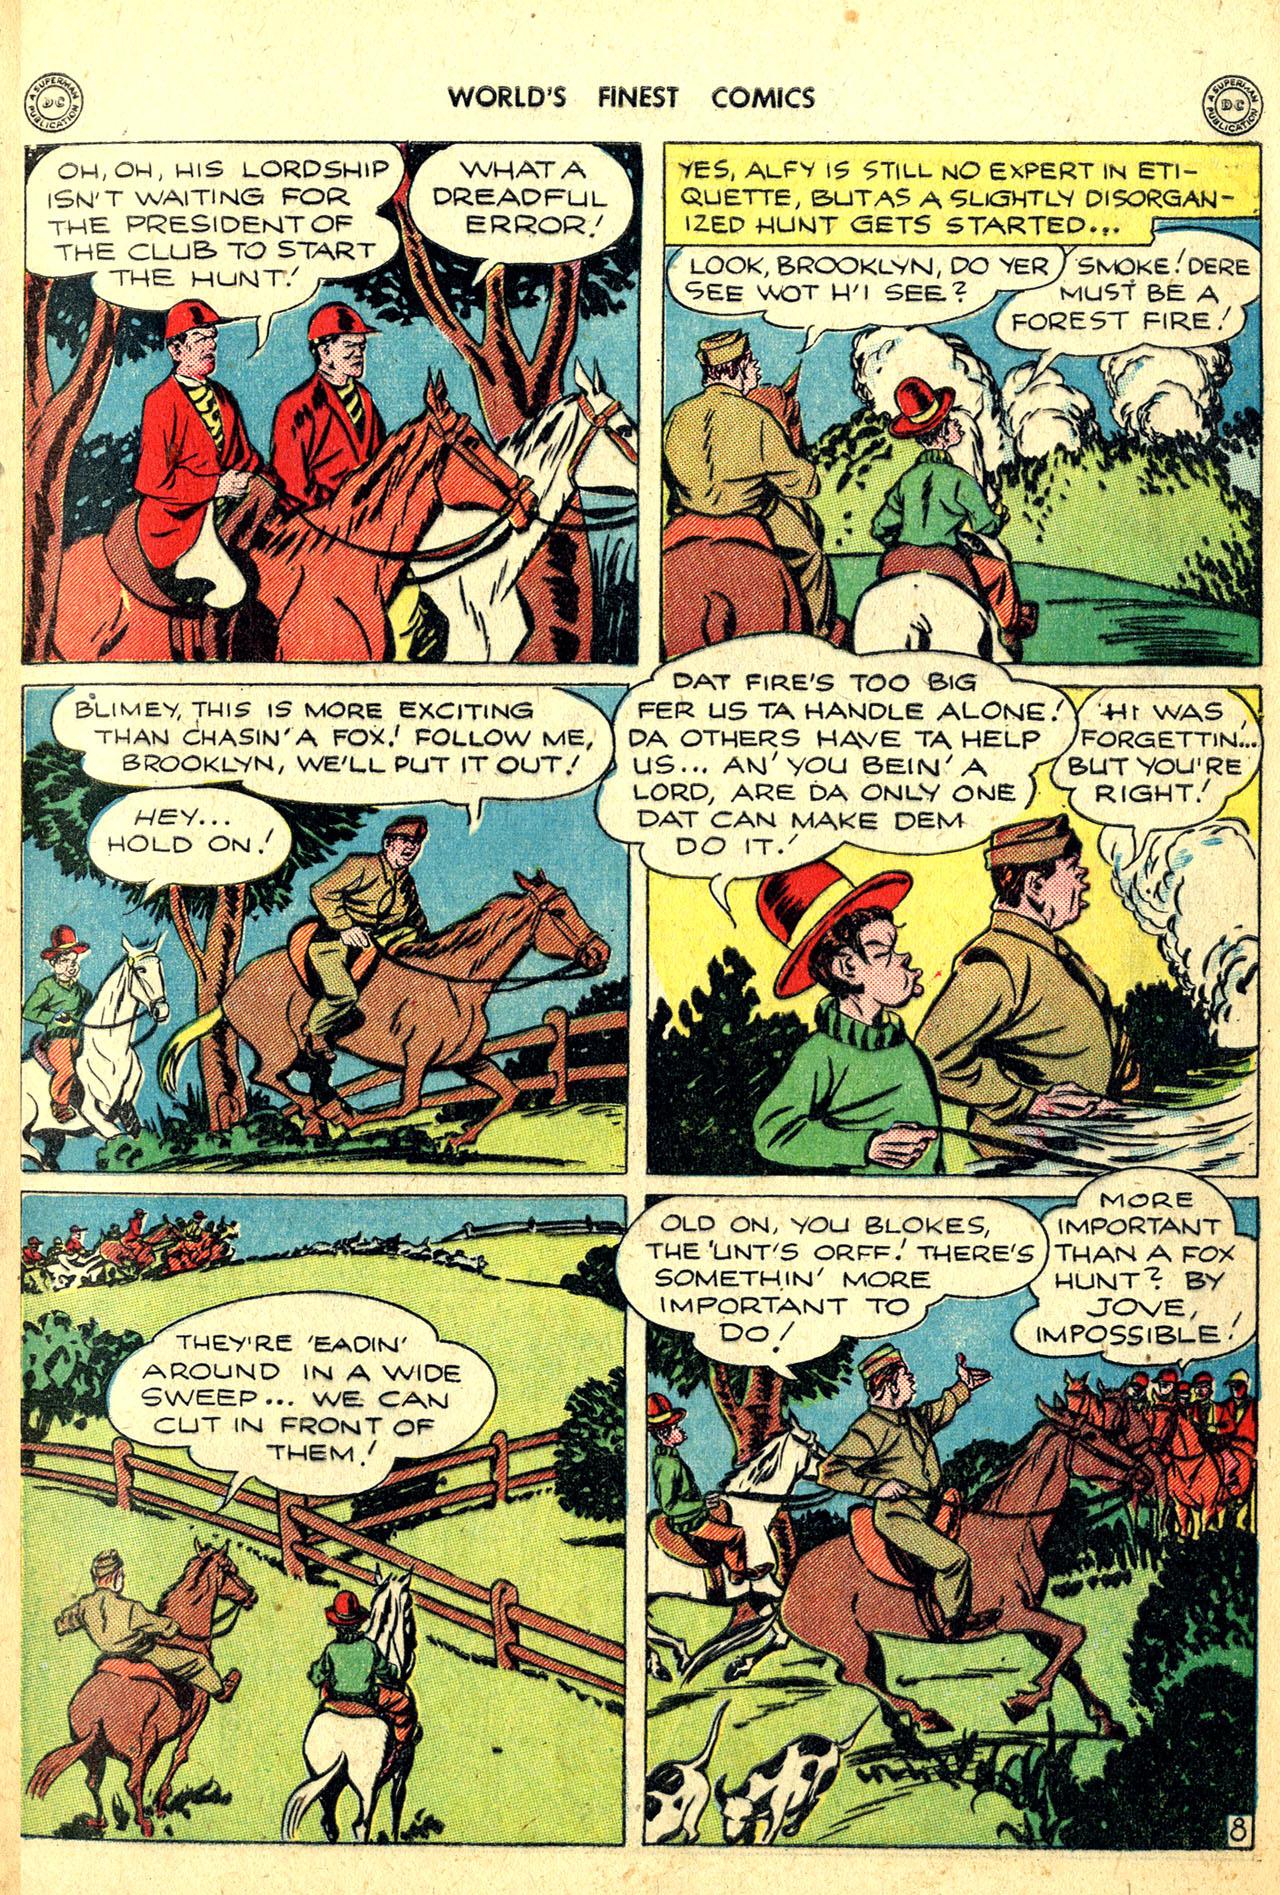 Read online World's Finest Comics comic -  Issue #18 - 43